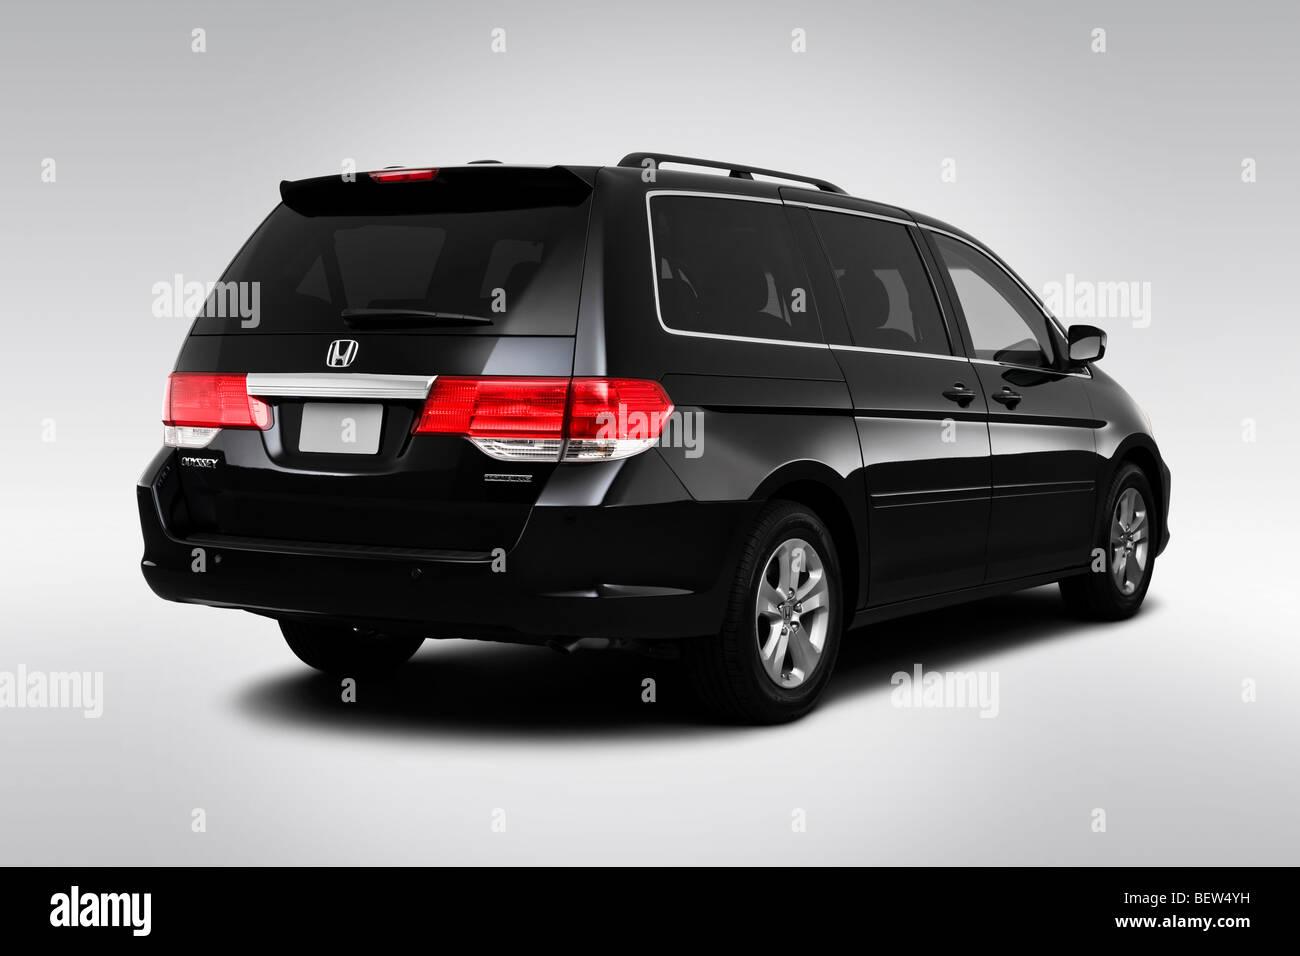 Kekurangan Honda Odyssey 2010 Spesifikasi